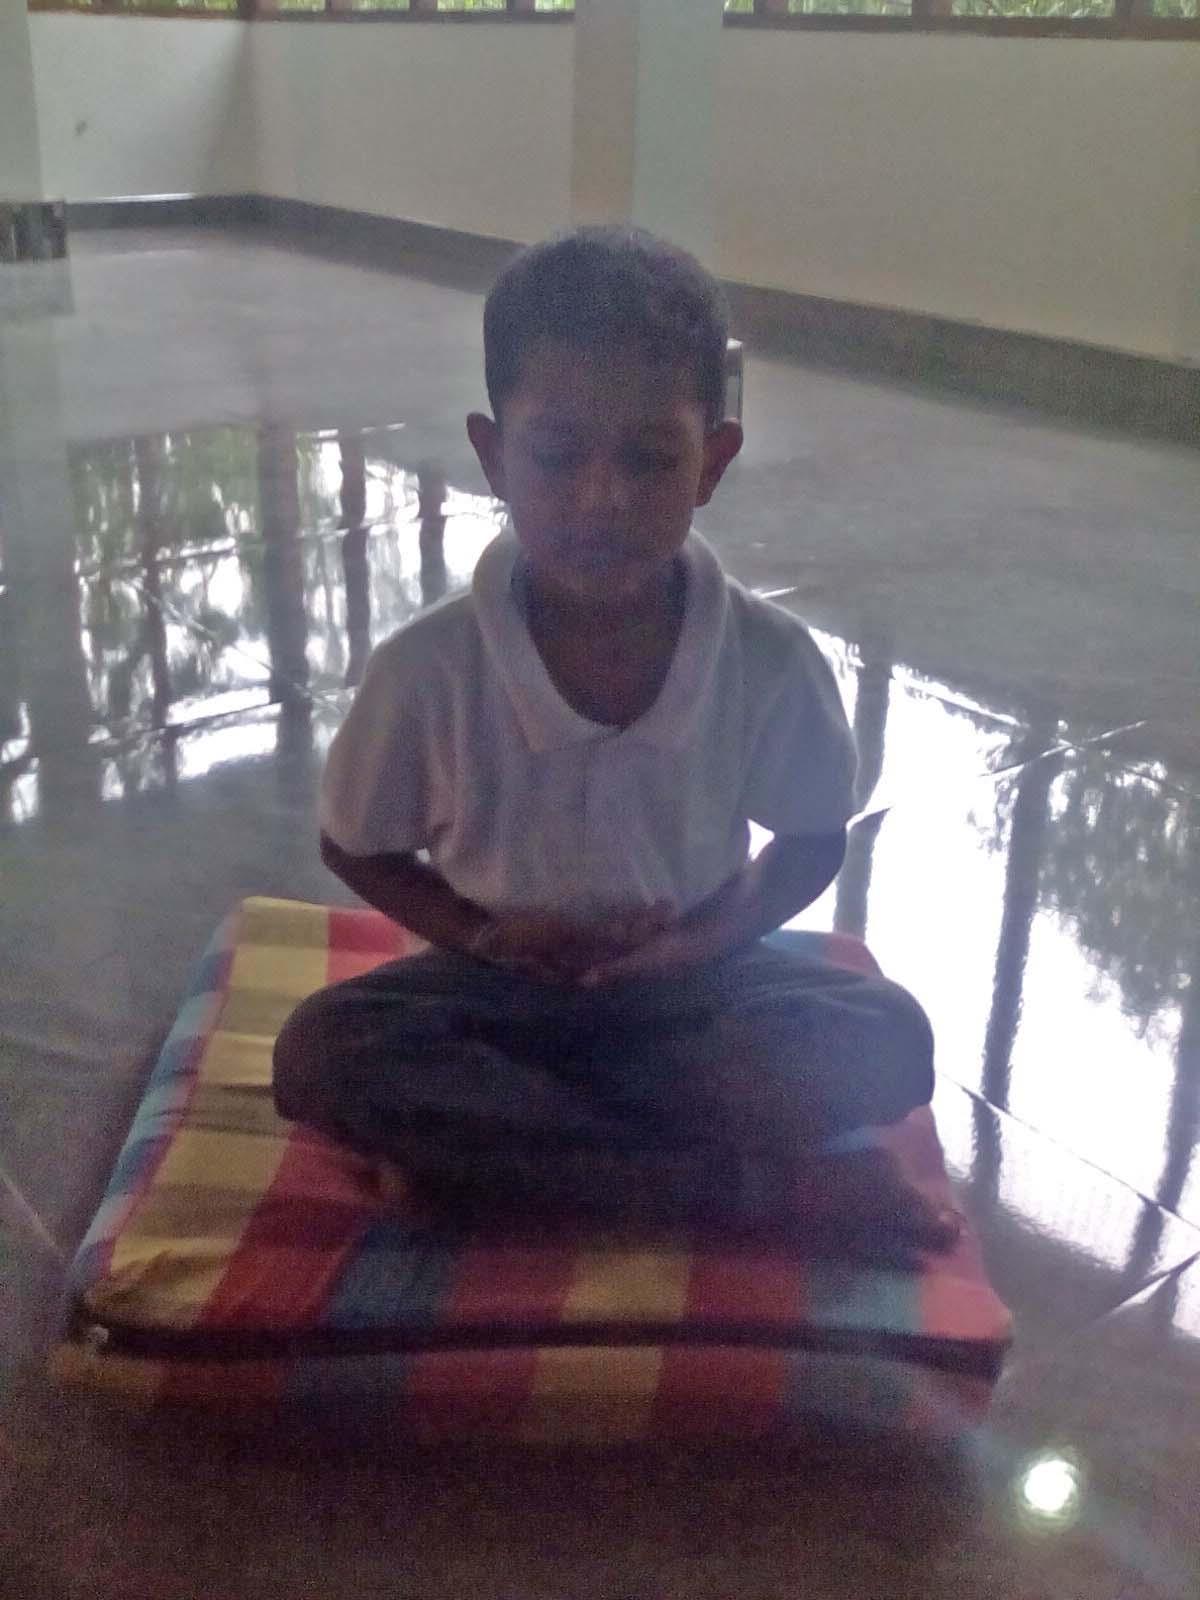 The Sati Pasala Mindfulness program held at Bandarawela